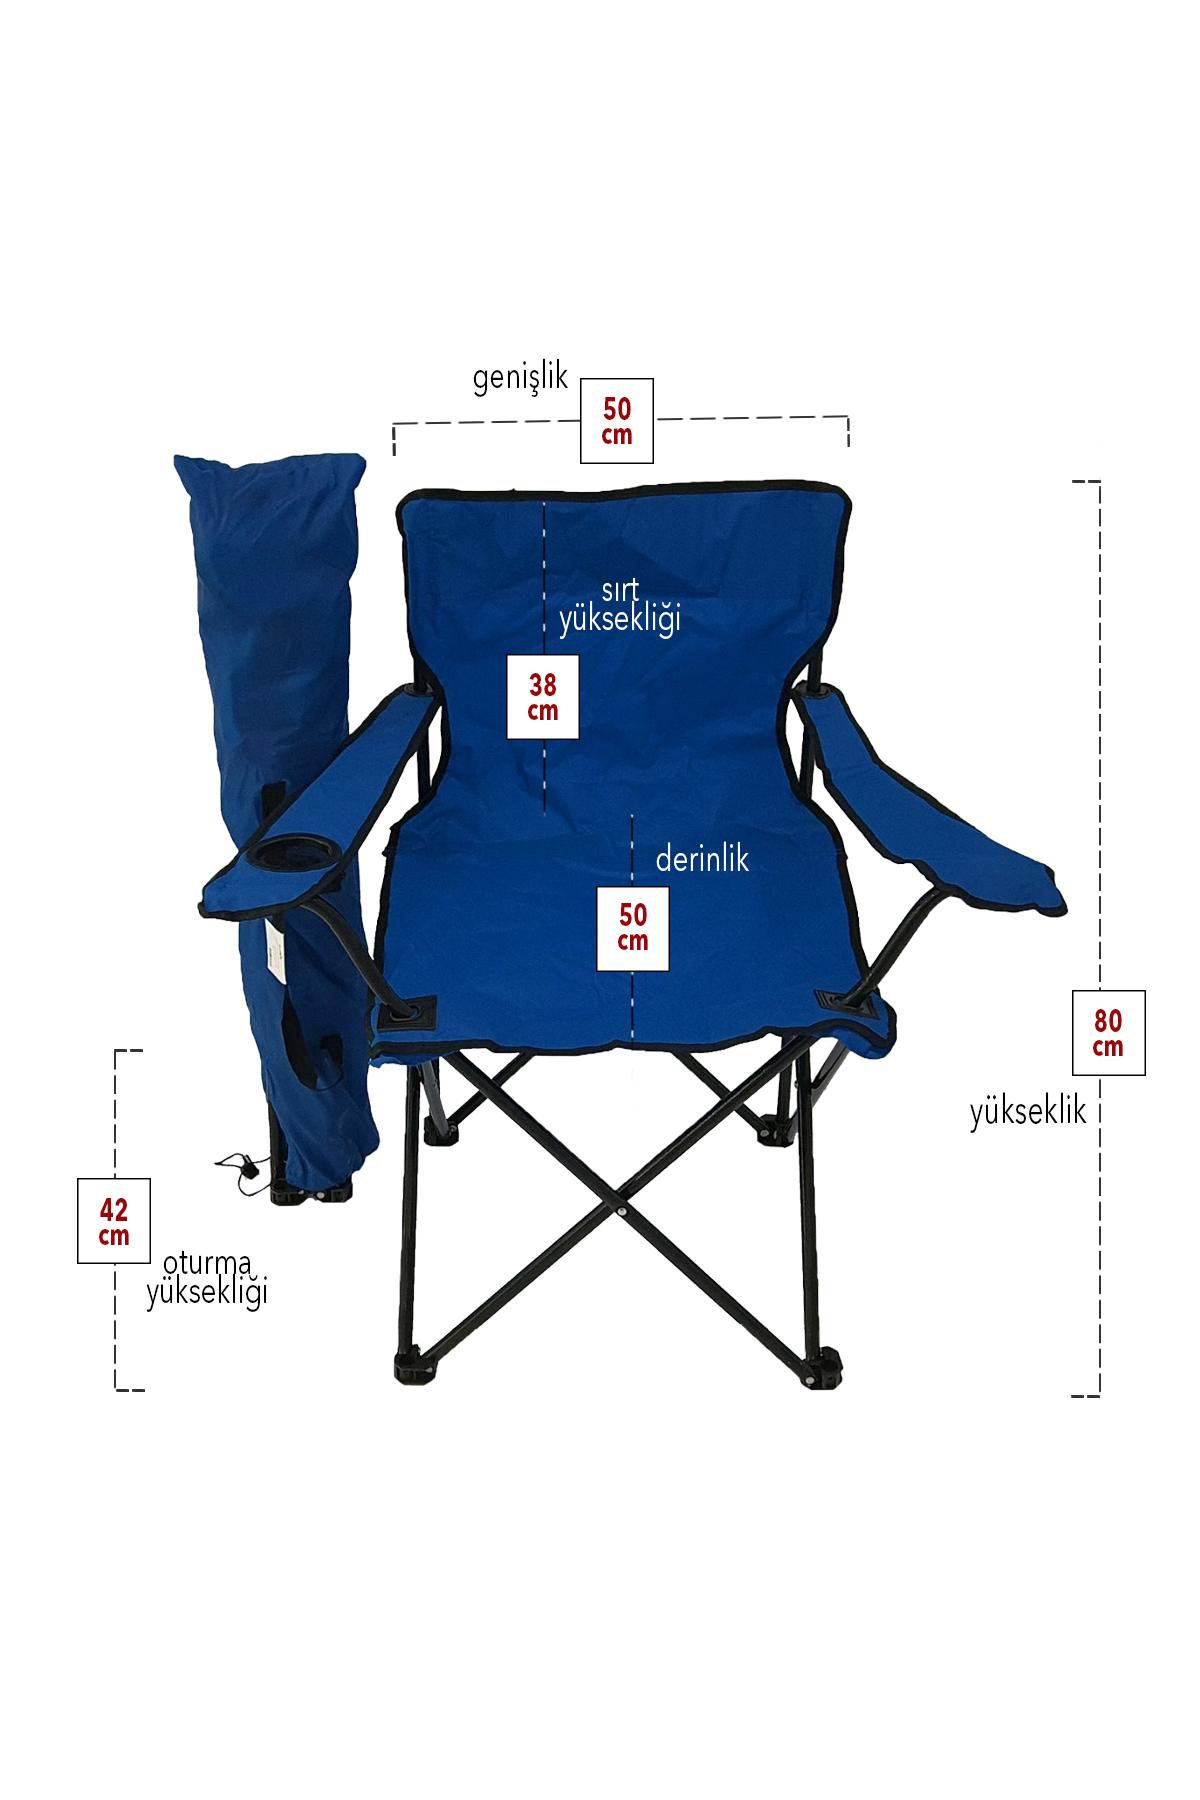 Bofigo 2-pack Camping Chair Picnic Chair Folding Chair Camping Chair with Carrying Bag Blue